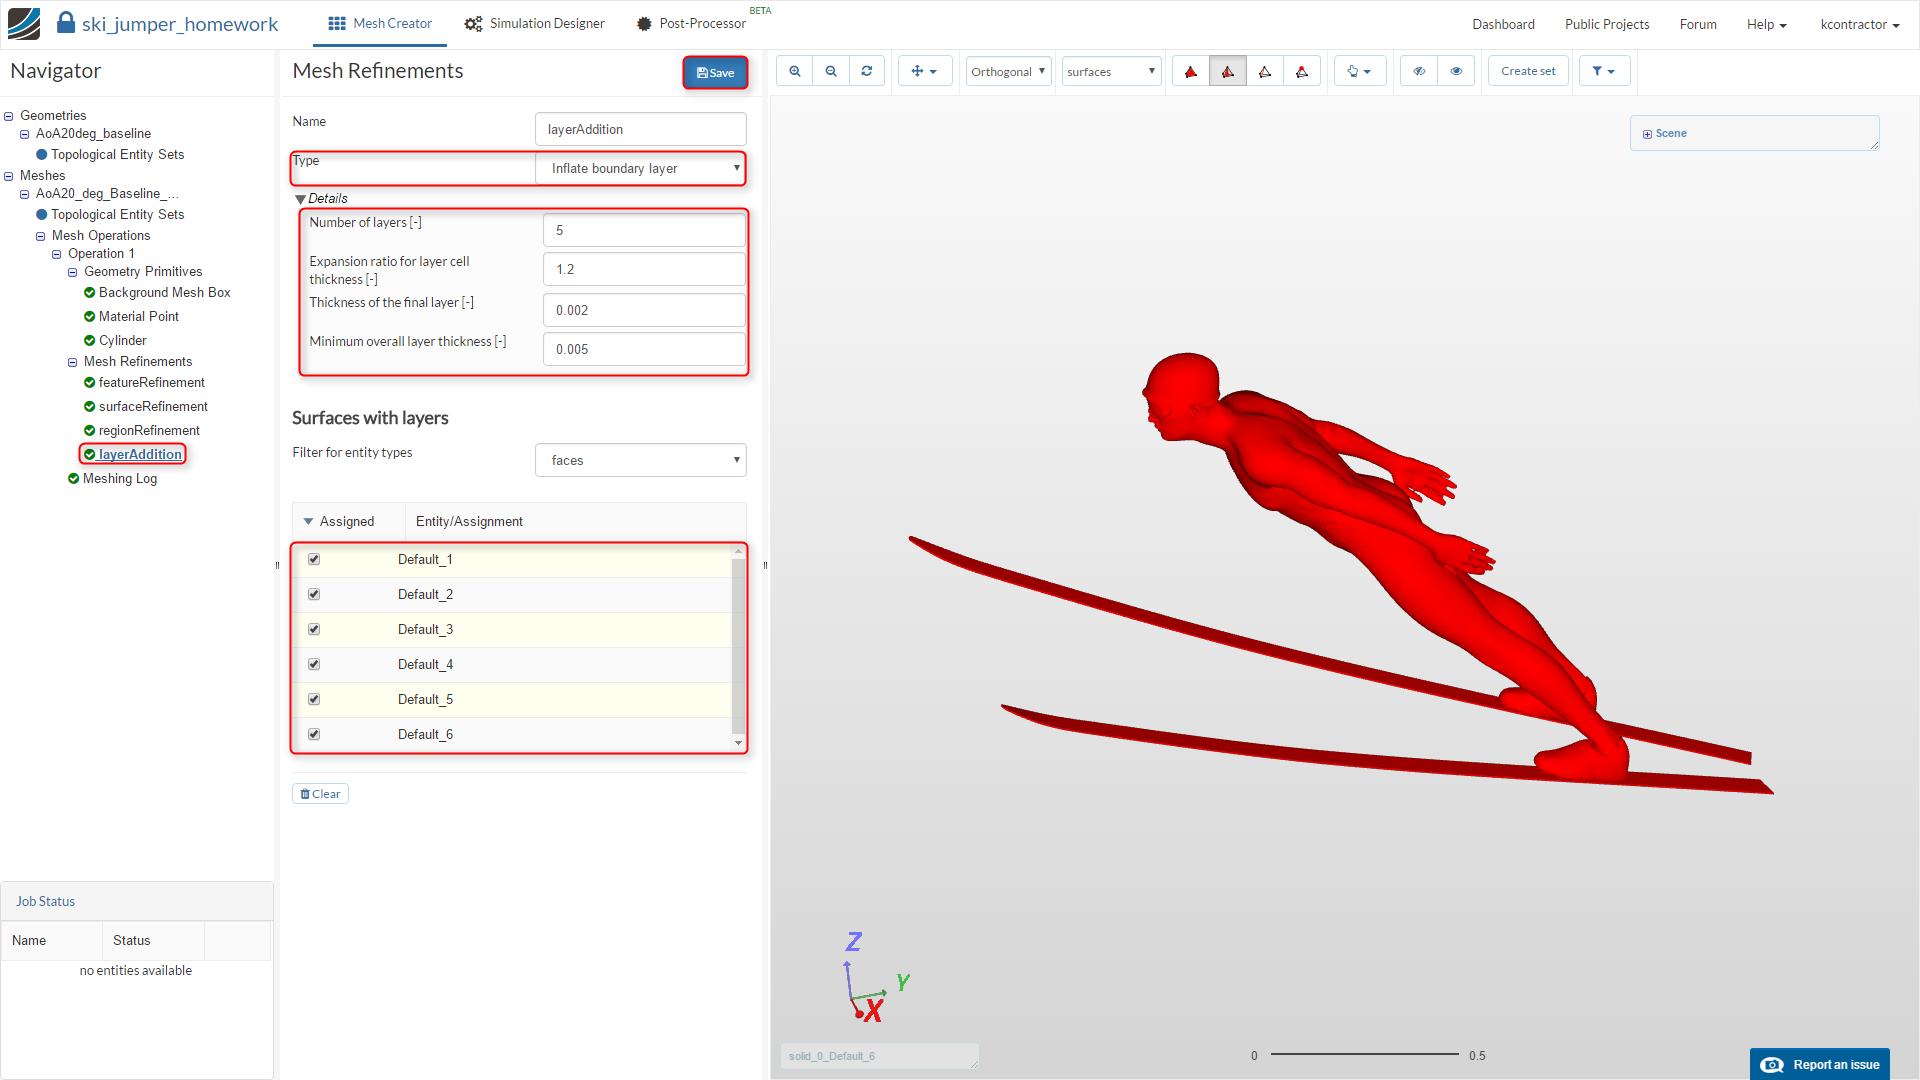 sports aerodynamics workshop homework step-by-step tutorial,  meshing, surface refinement